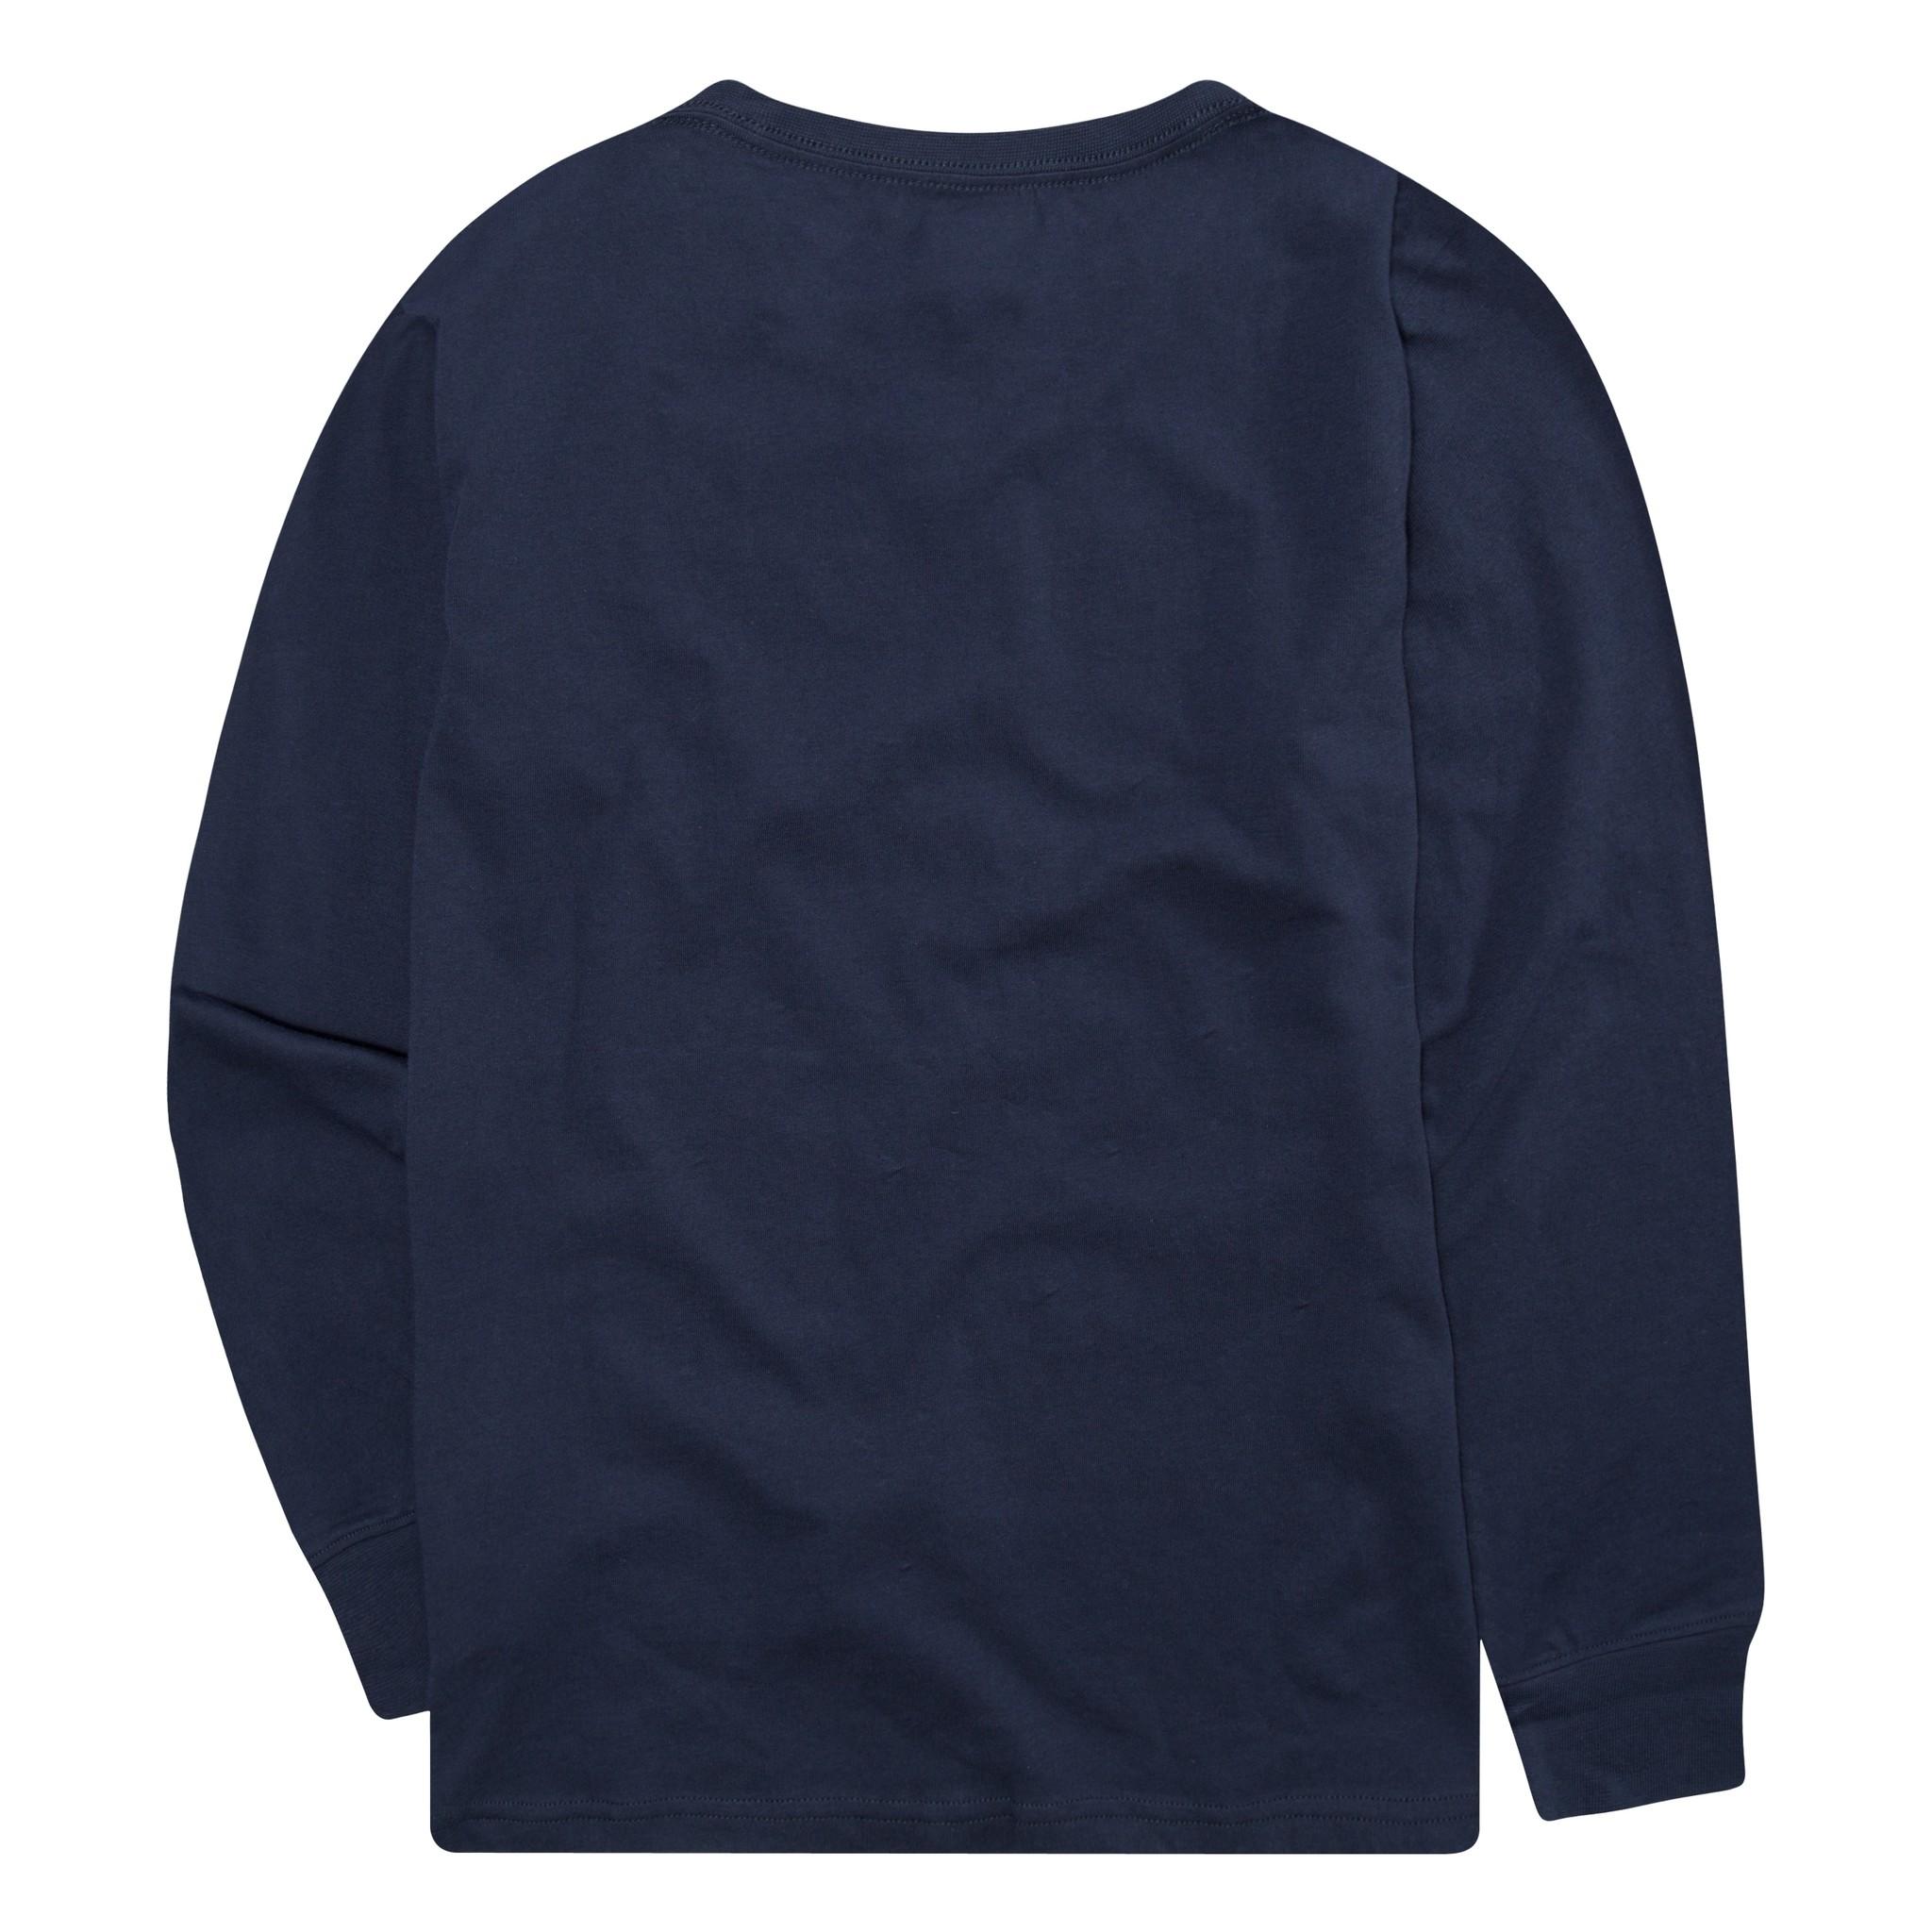 Levi's Longsleeve t-shirt dress blues